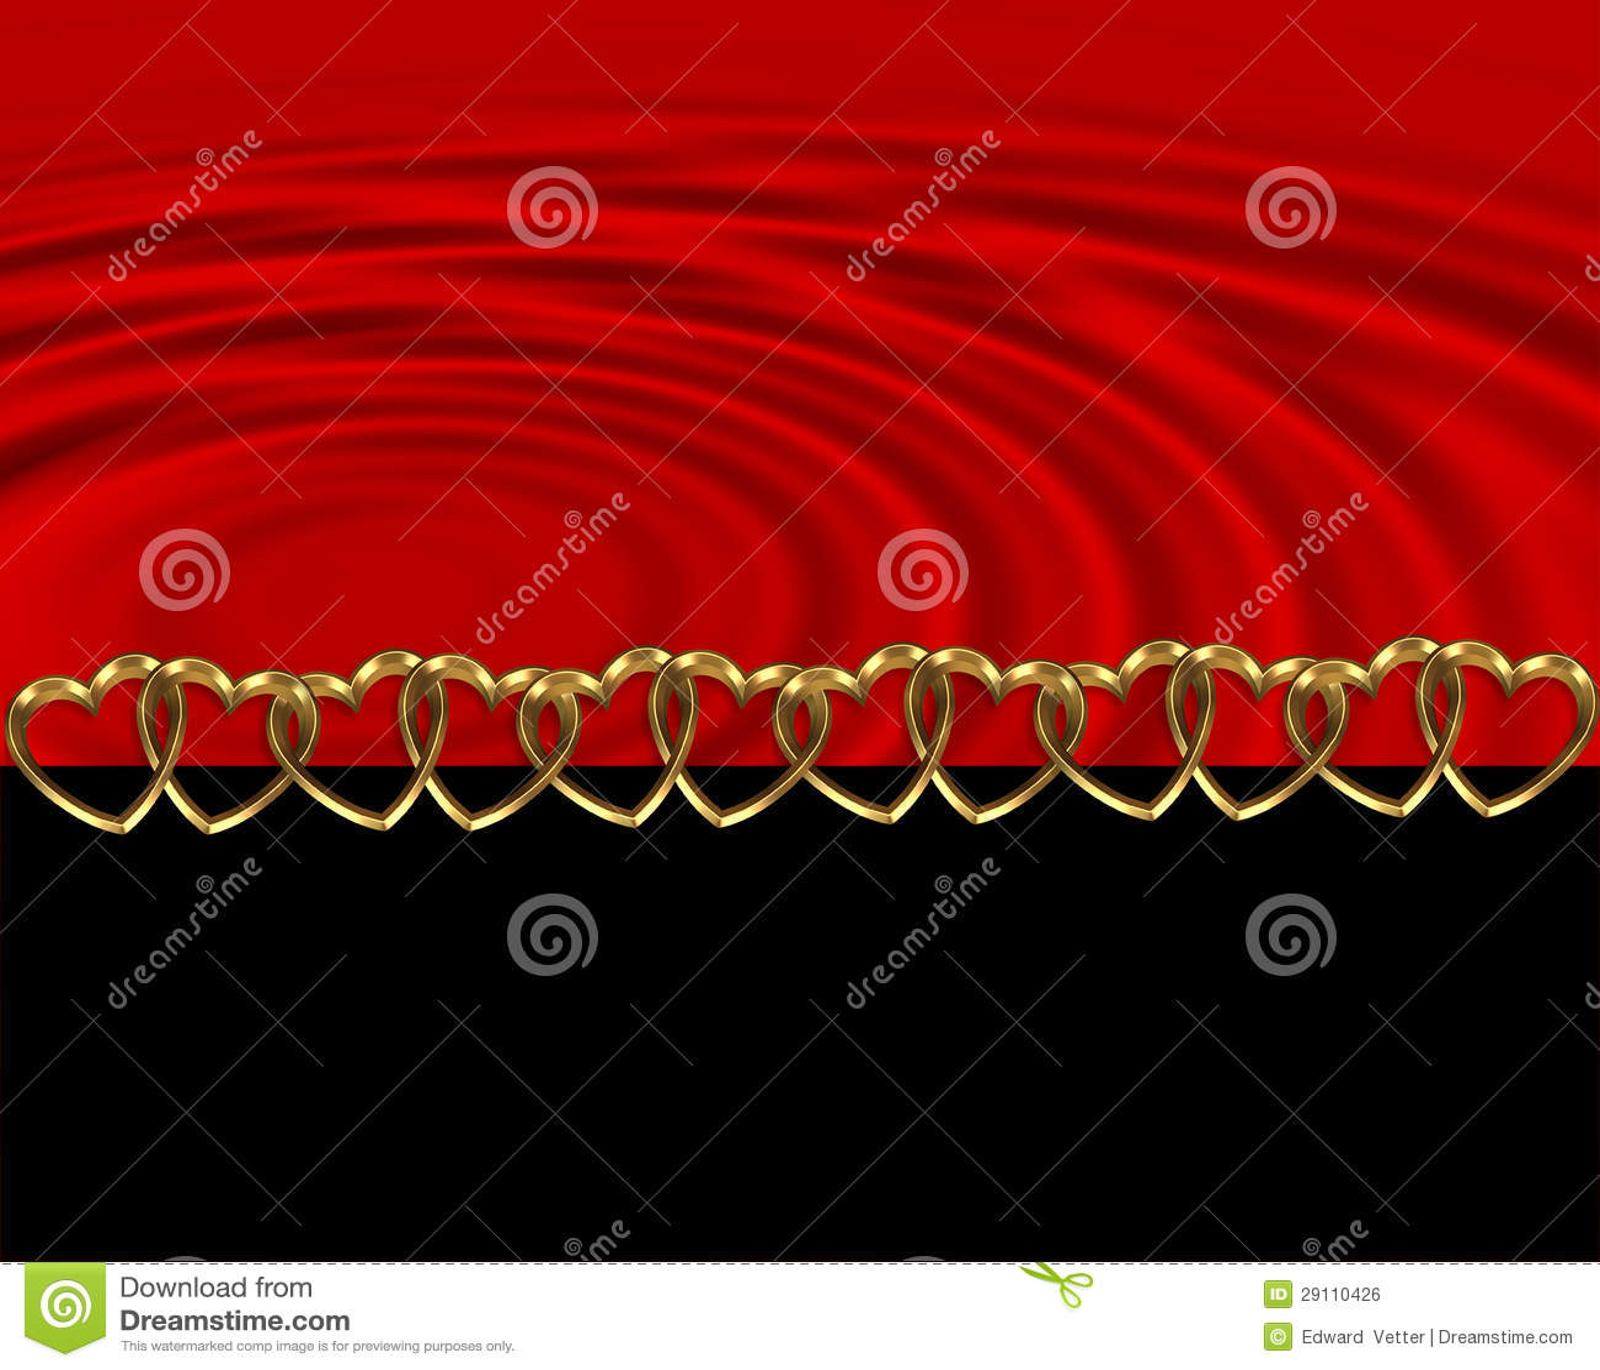 Wedding Invitation Red And Black Stock Illustration - Illustration ...